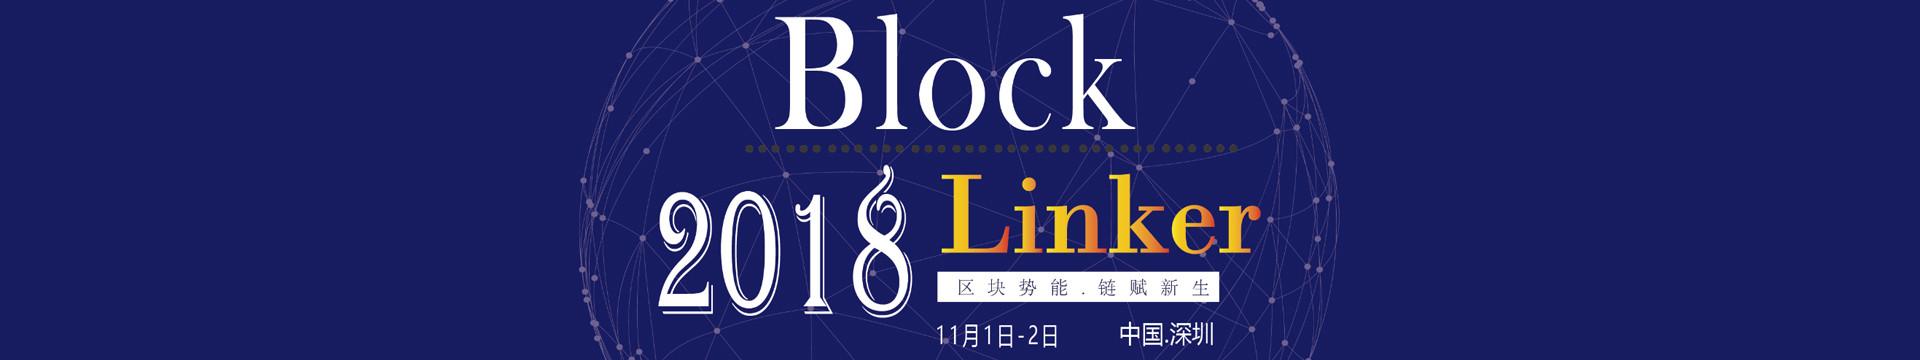 BlockLinker2018@链客峰会